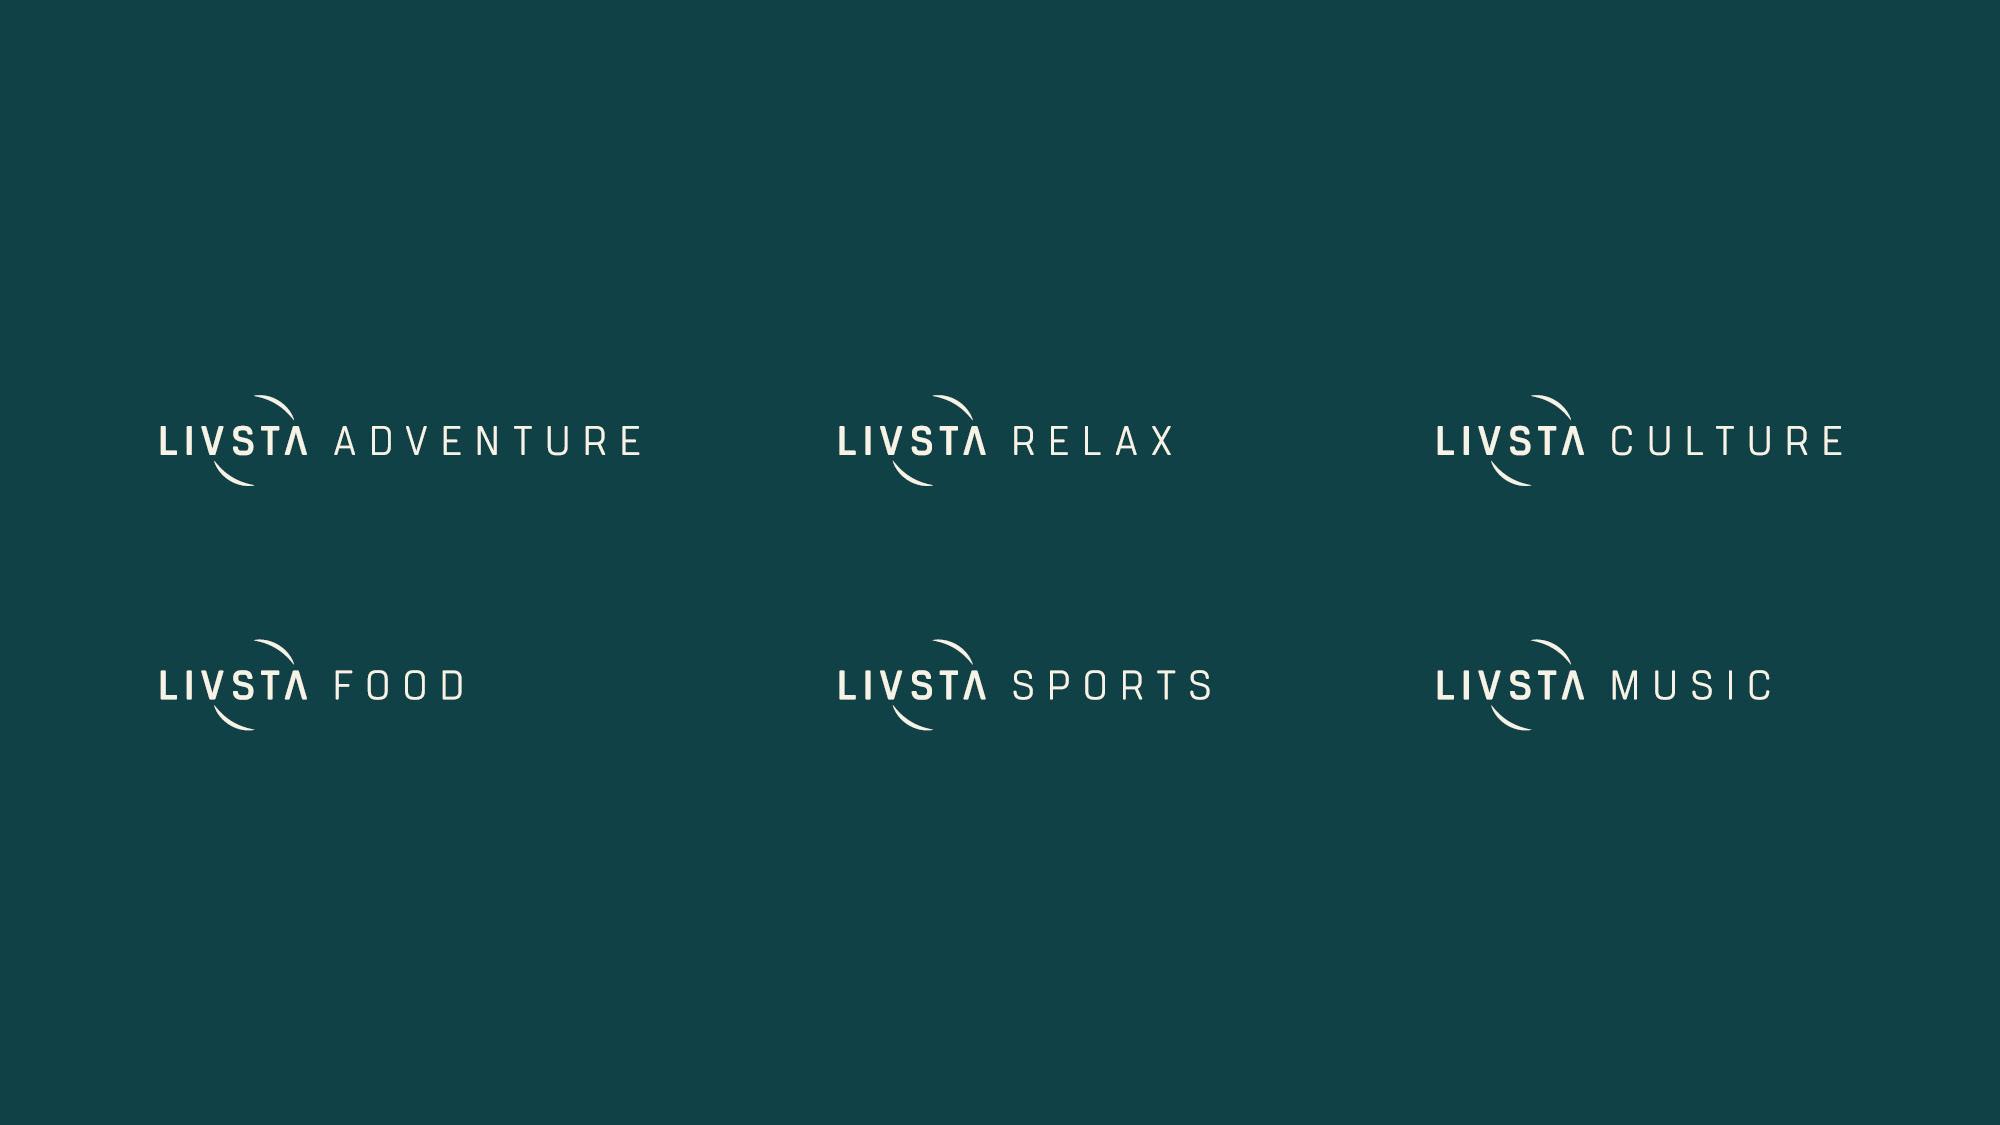 Livsta-Nacione-Branding4